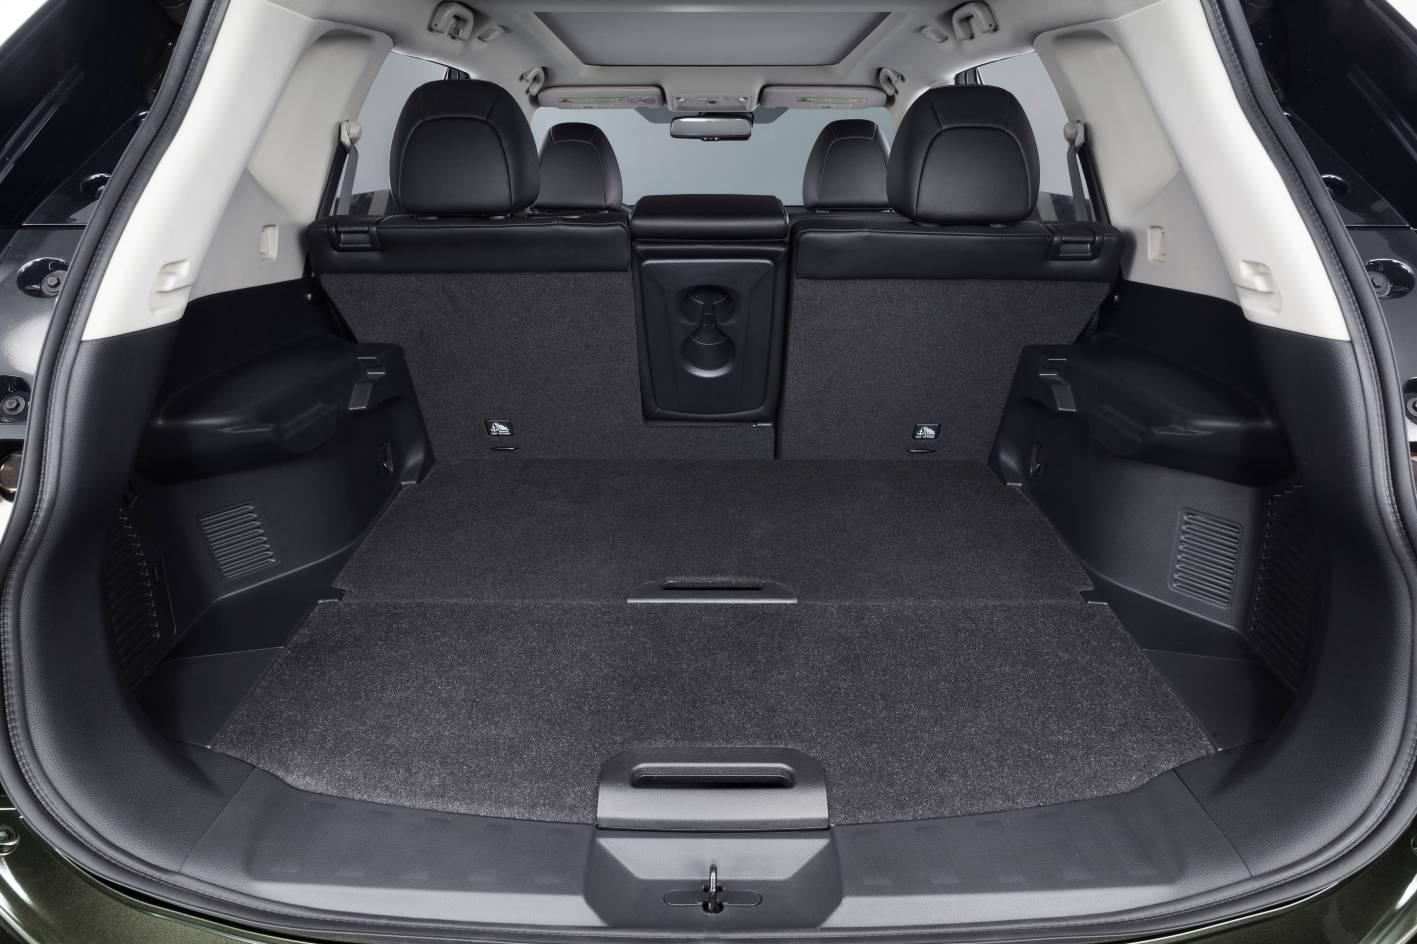 Nissan X-Trail luggage space - ForceGT.com